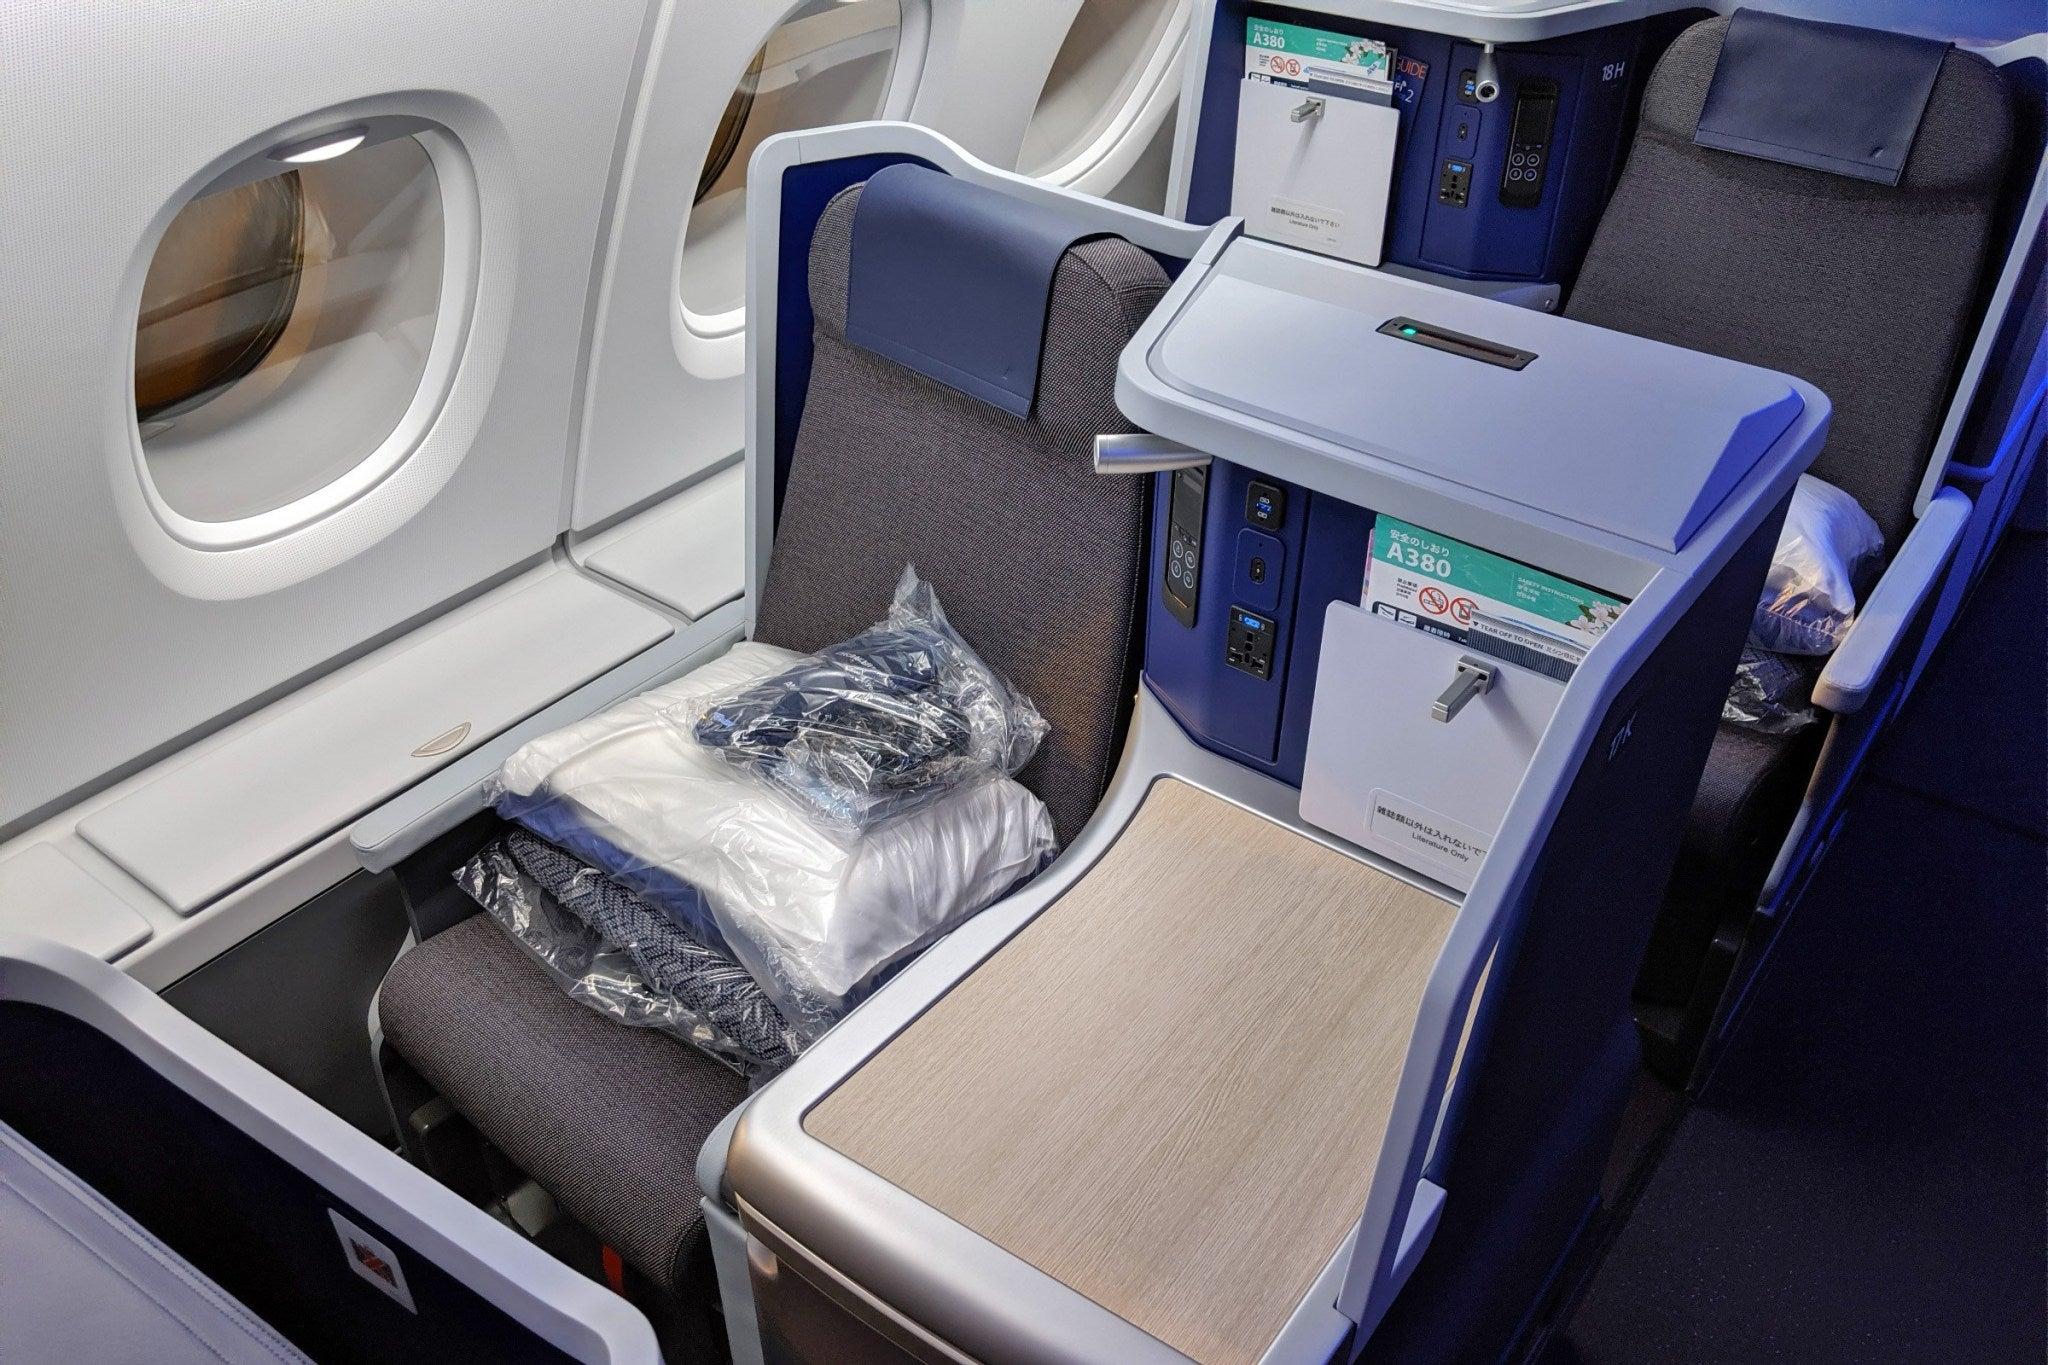 ANA's A380 business class seat. Photo Courtesy TPG's Zach Honig.